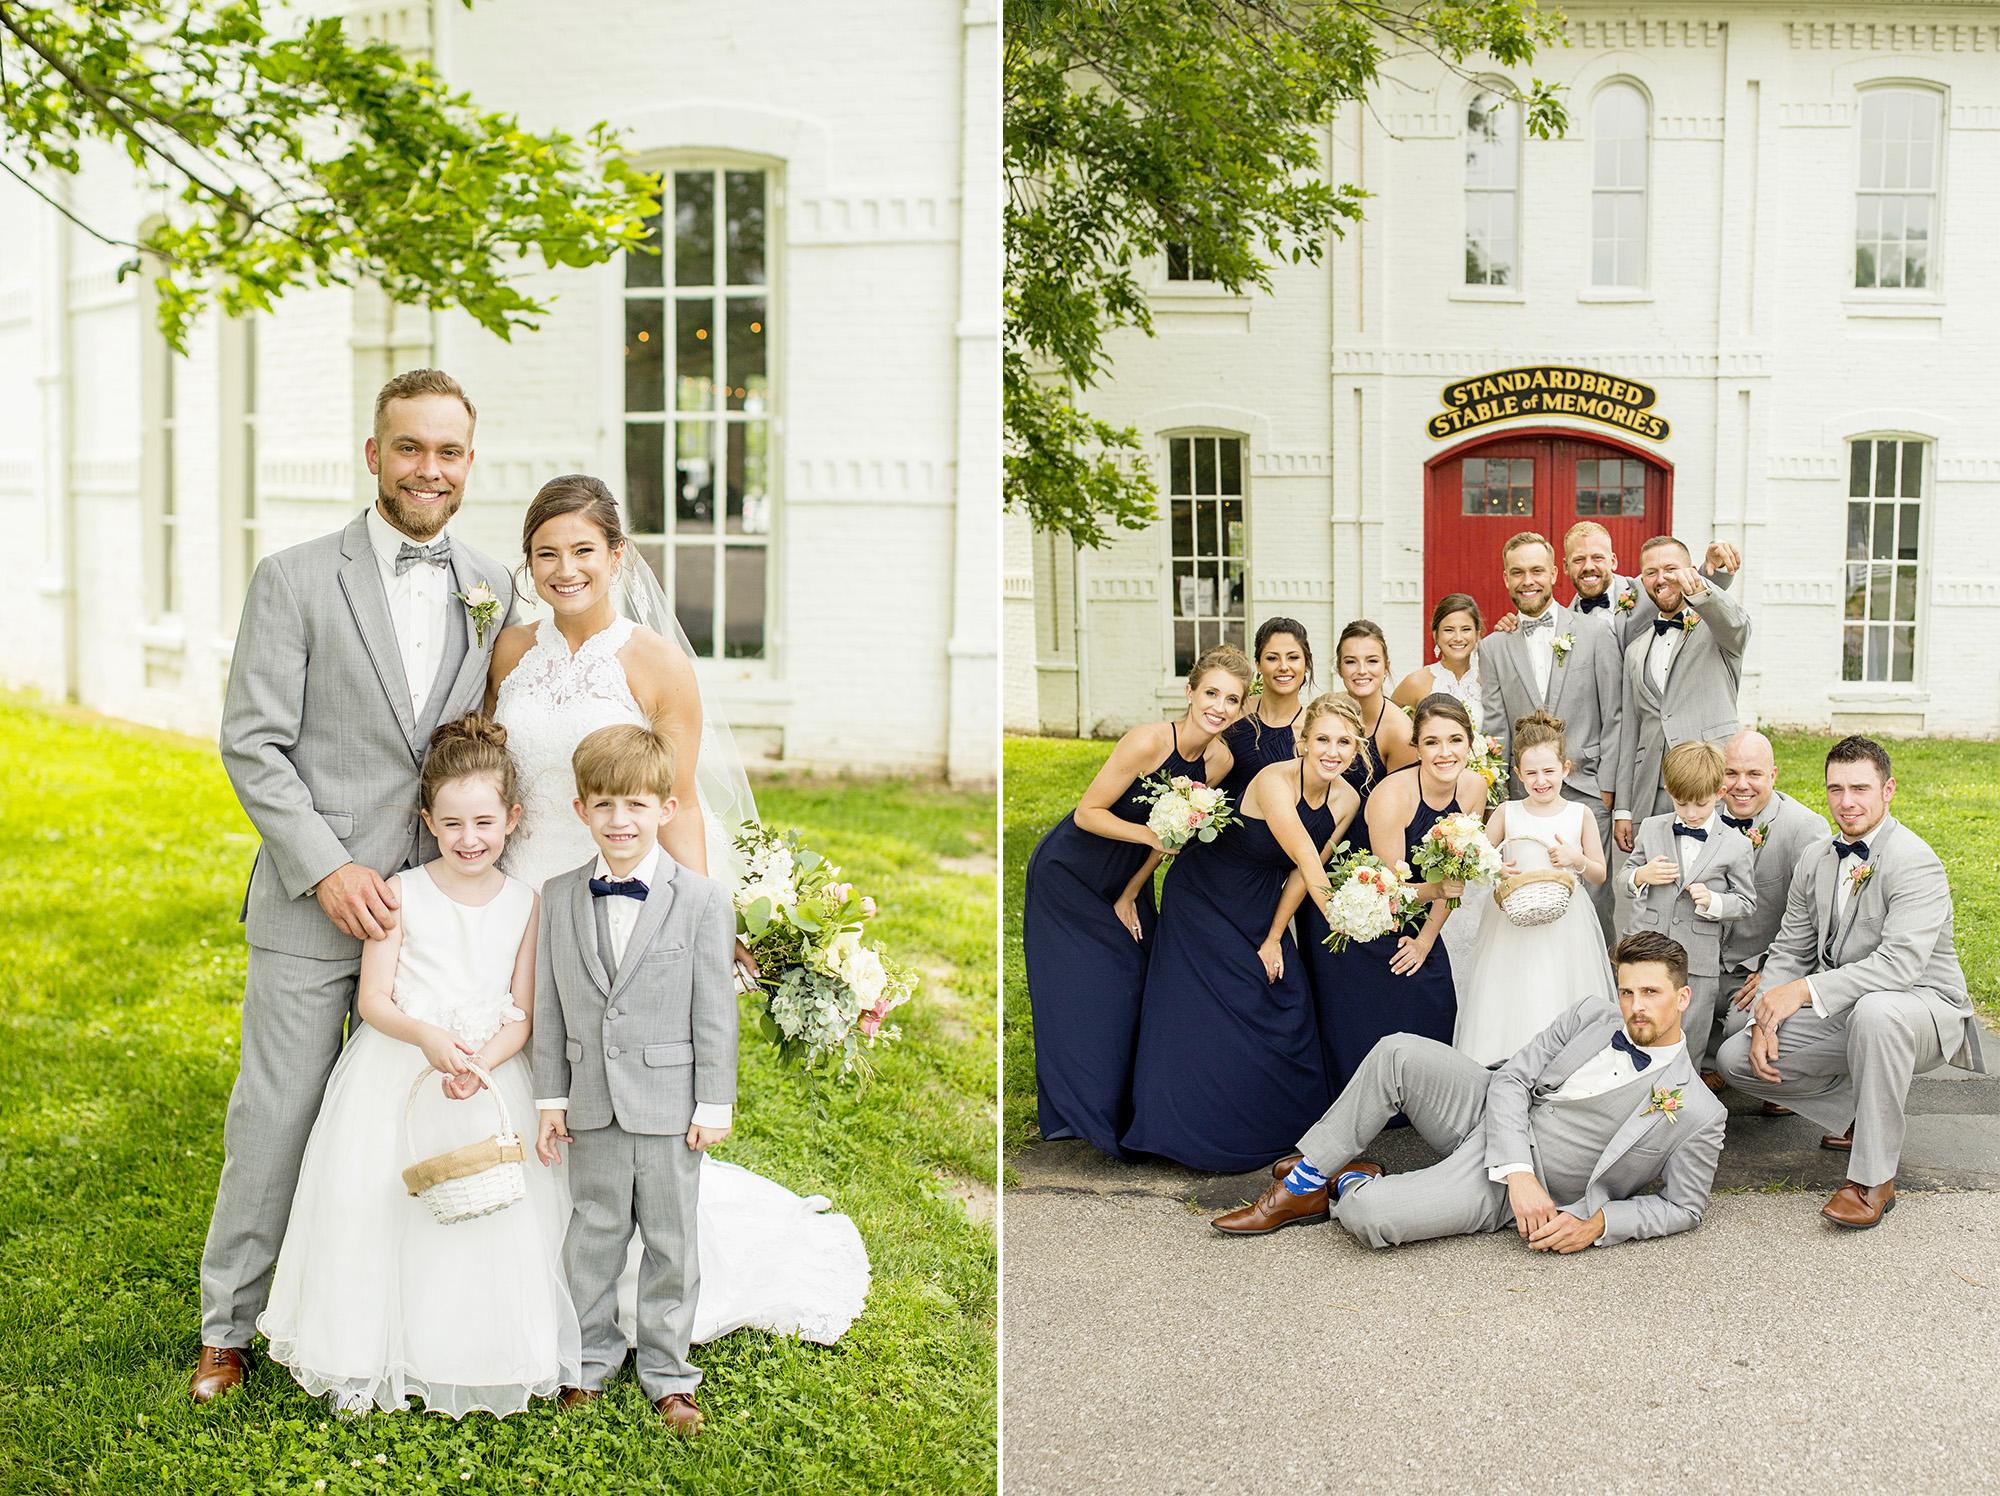 Seriously_Sabrina_Photography_Lexington_Kentucky_Round_Barn_Red_Mile_Stable_of_Memories_Wedding_Hart_54.jpg